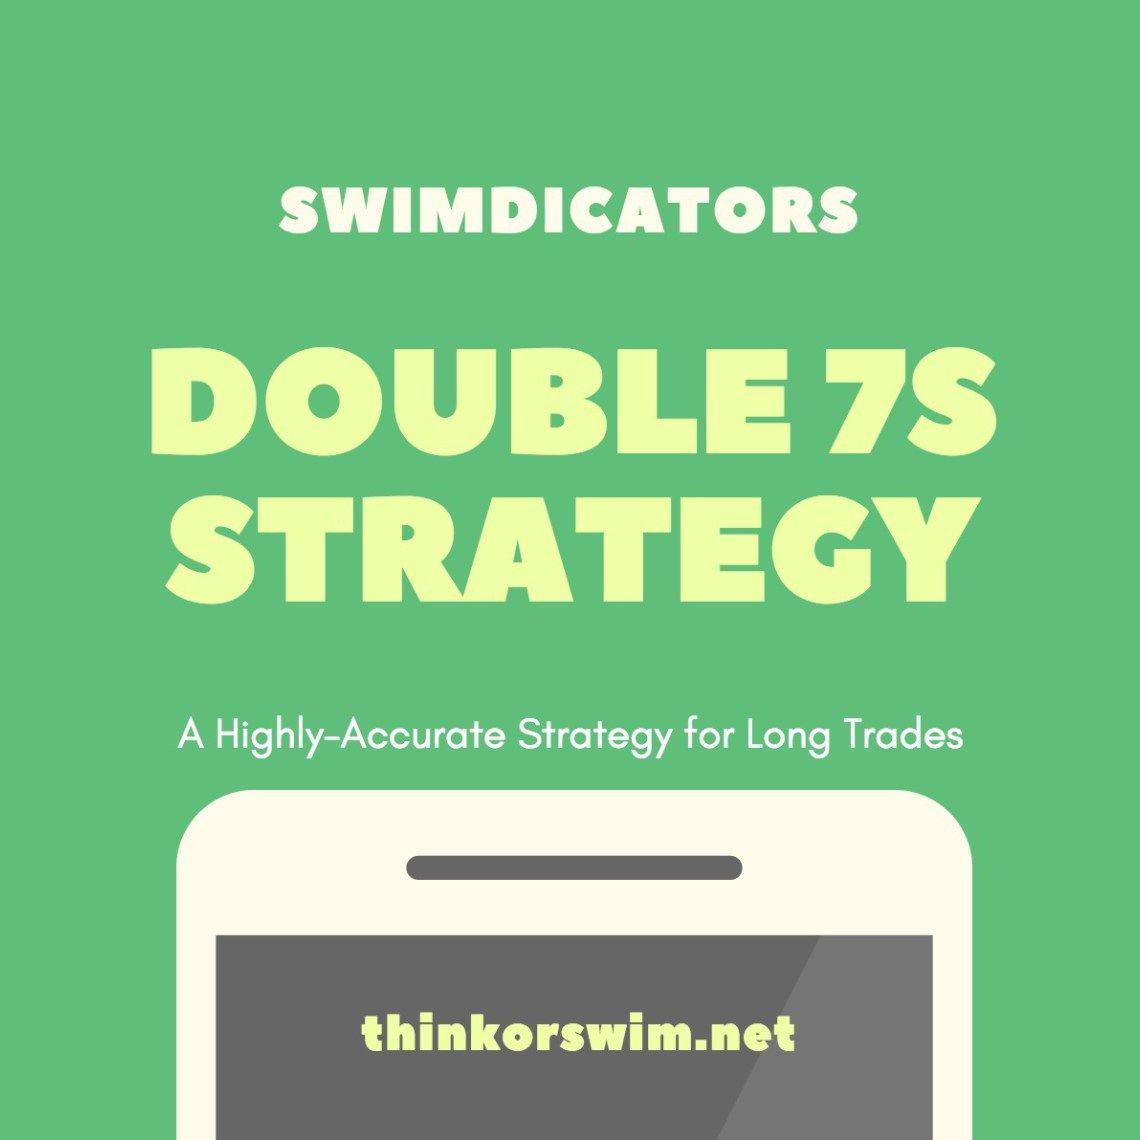 Double 7s Trading Strategy For Thinkorswim Thinkorswim Downloads